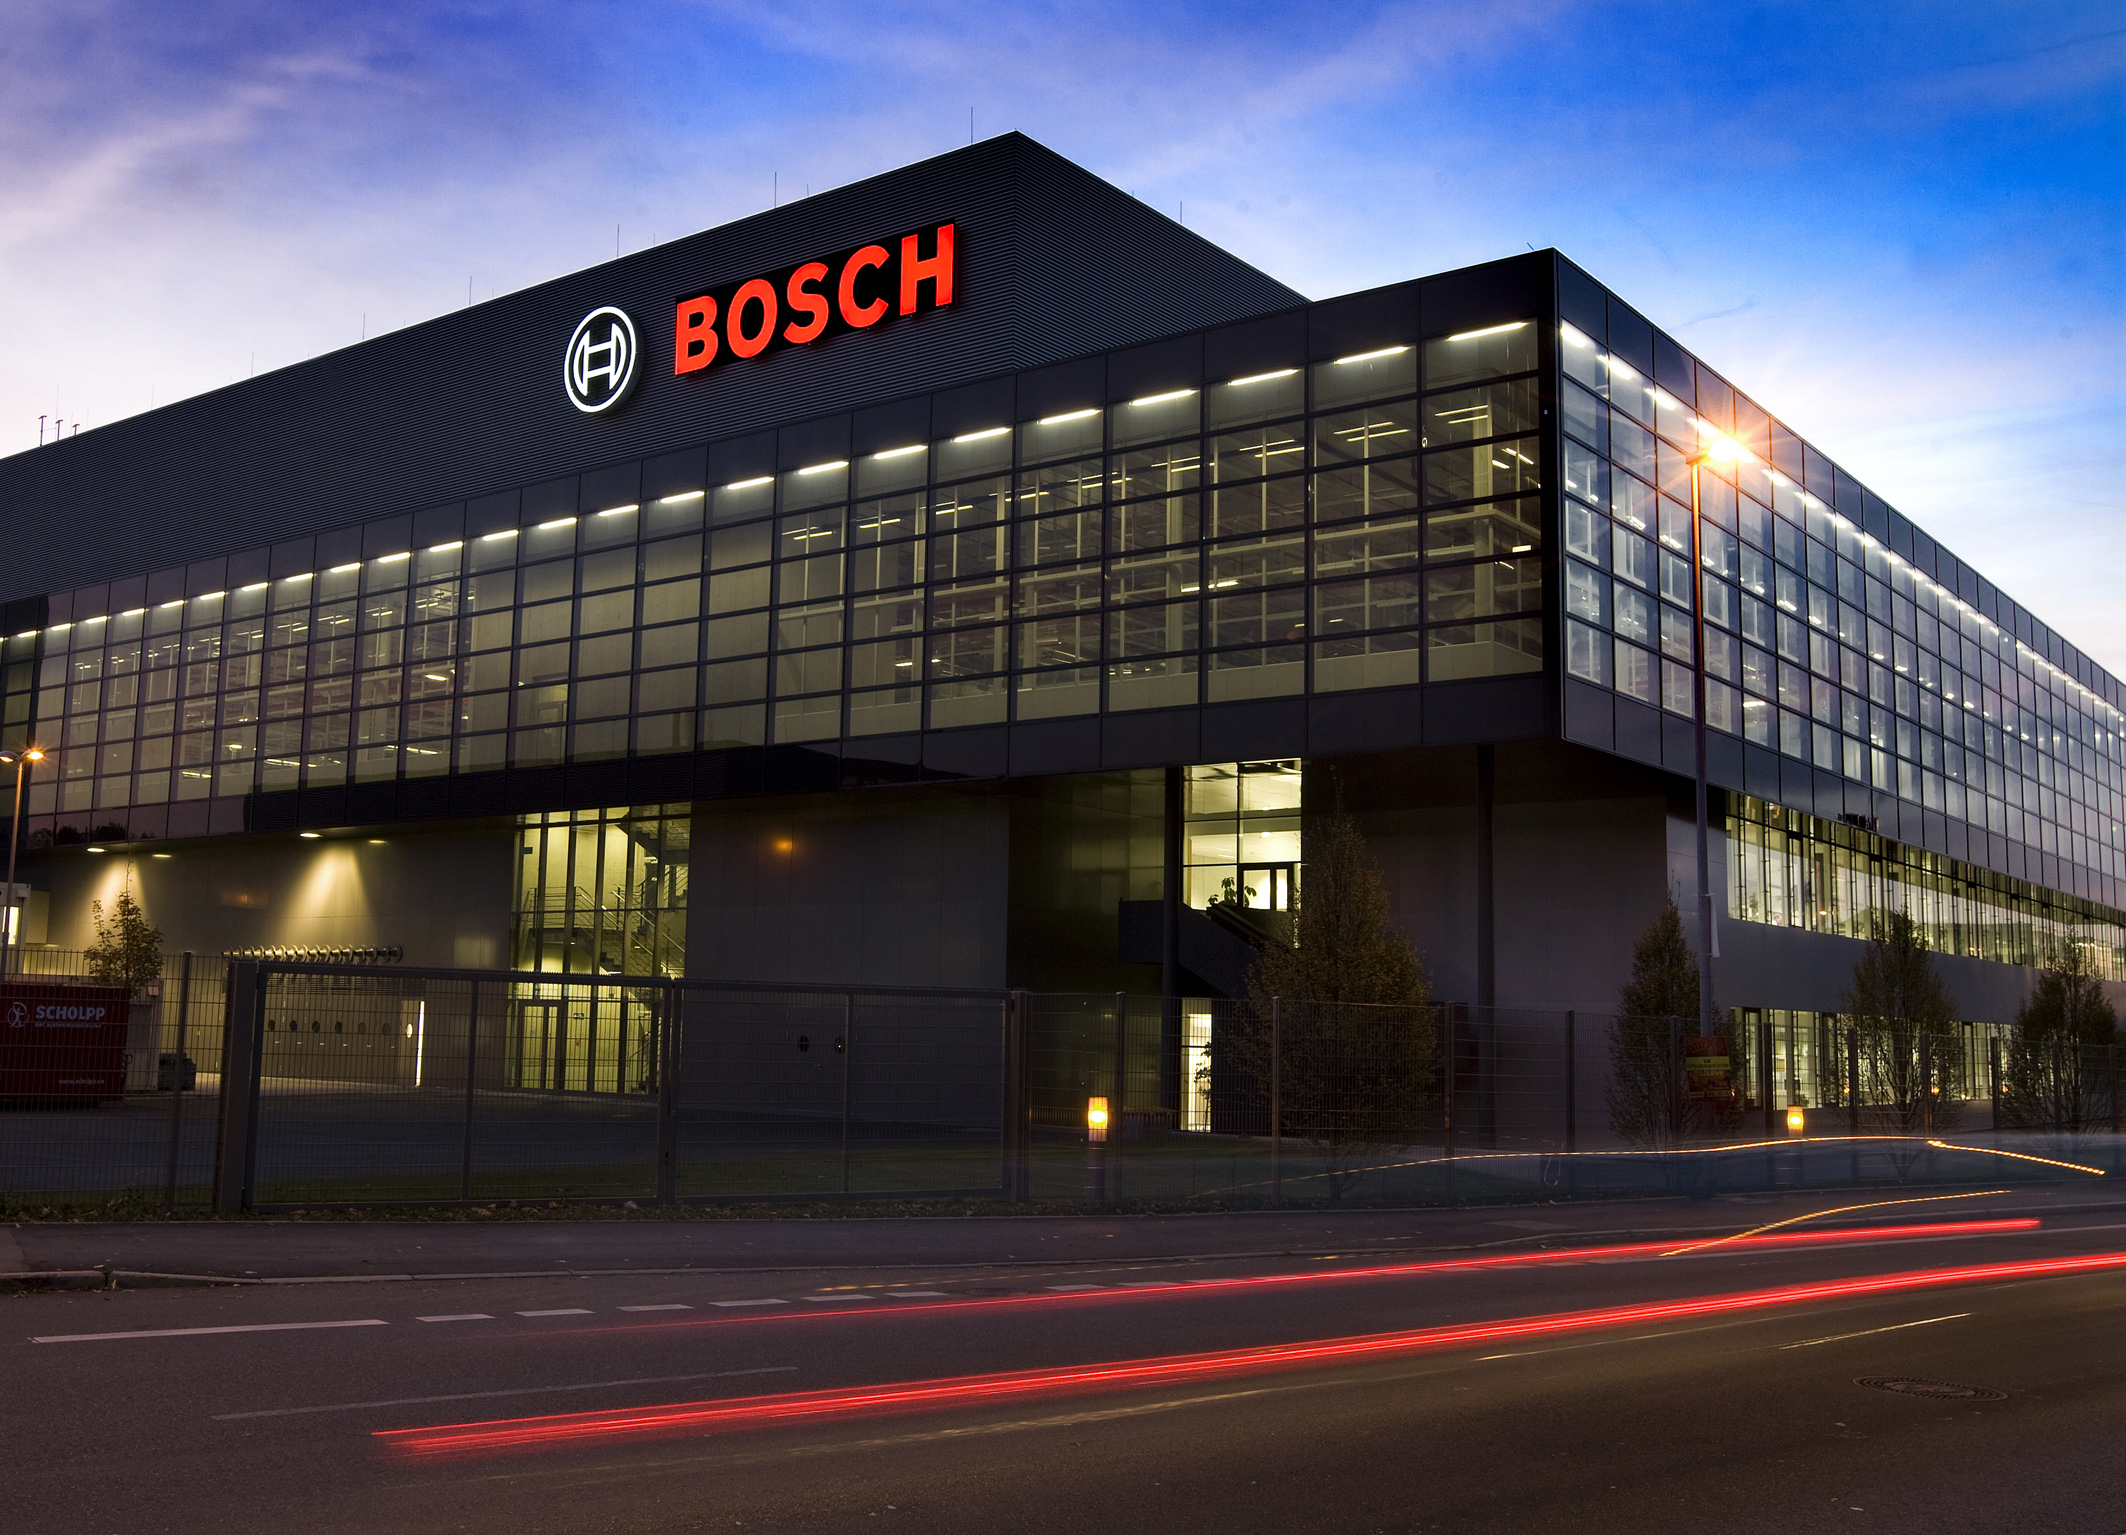 environment award for businesses 2012 for bosch bosch media service. Black Bedroom Furniture Sets. Home Design Ideas